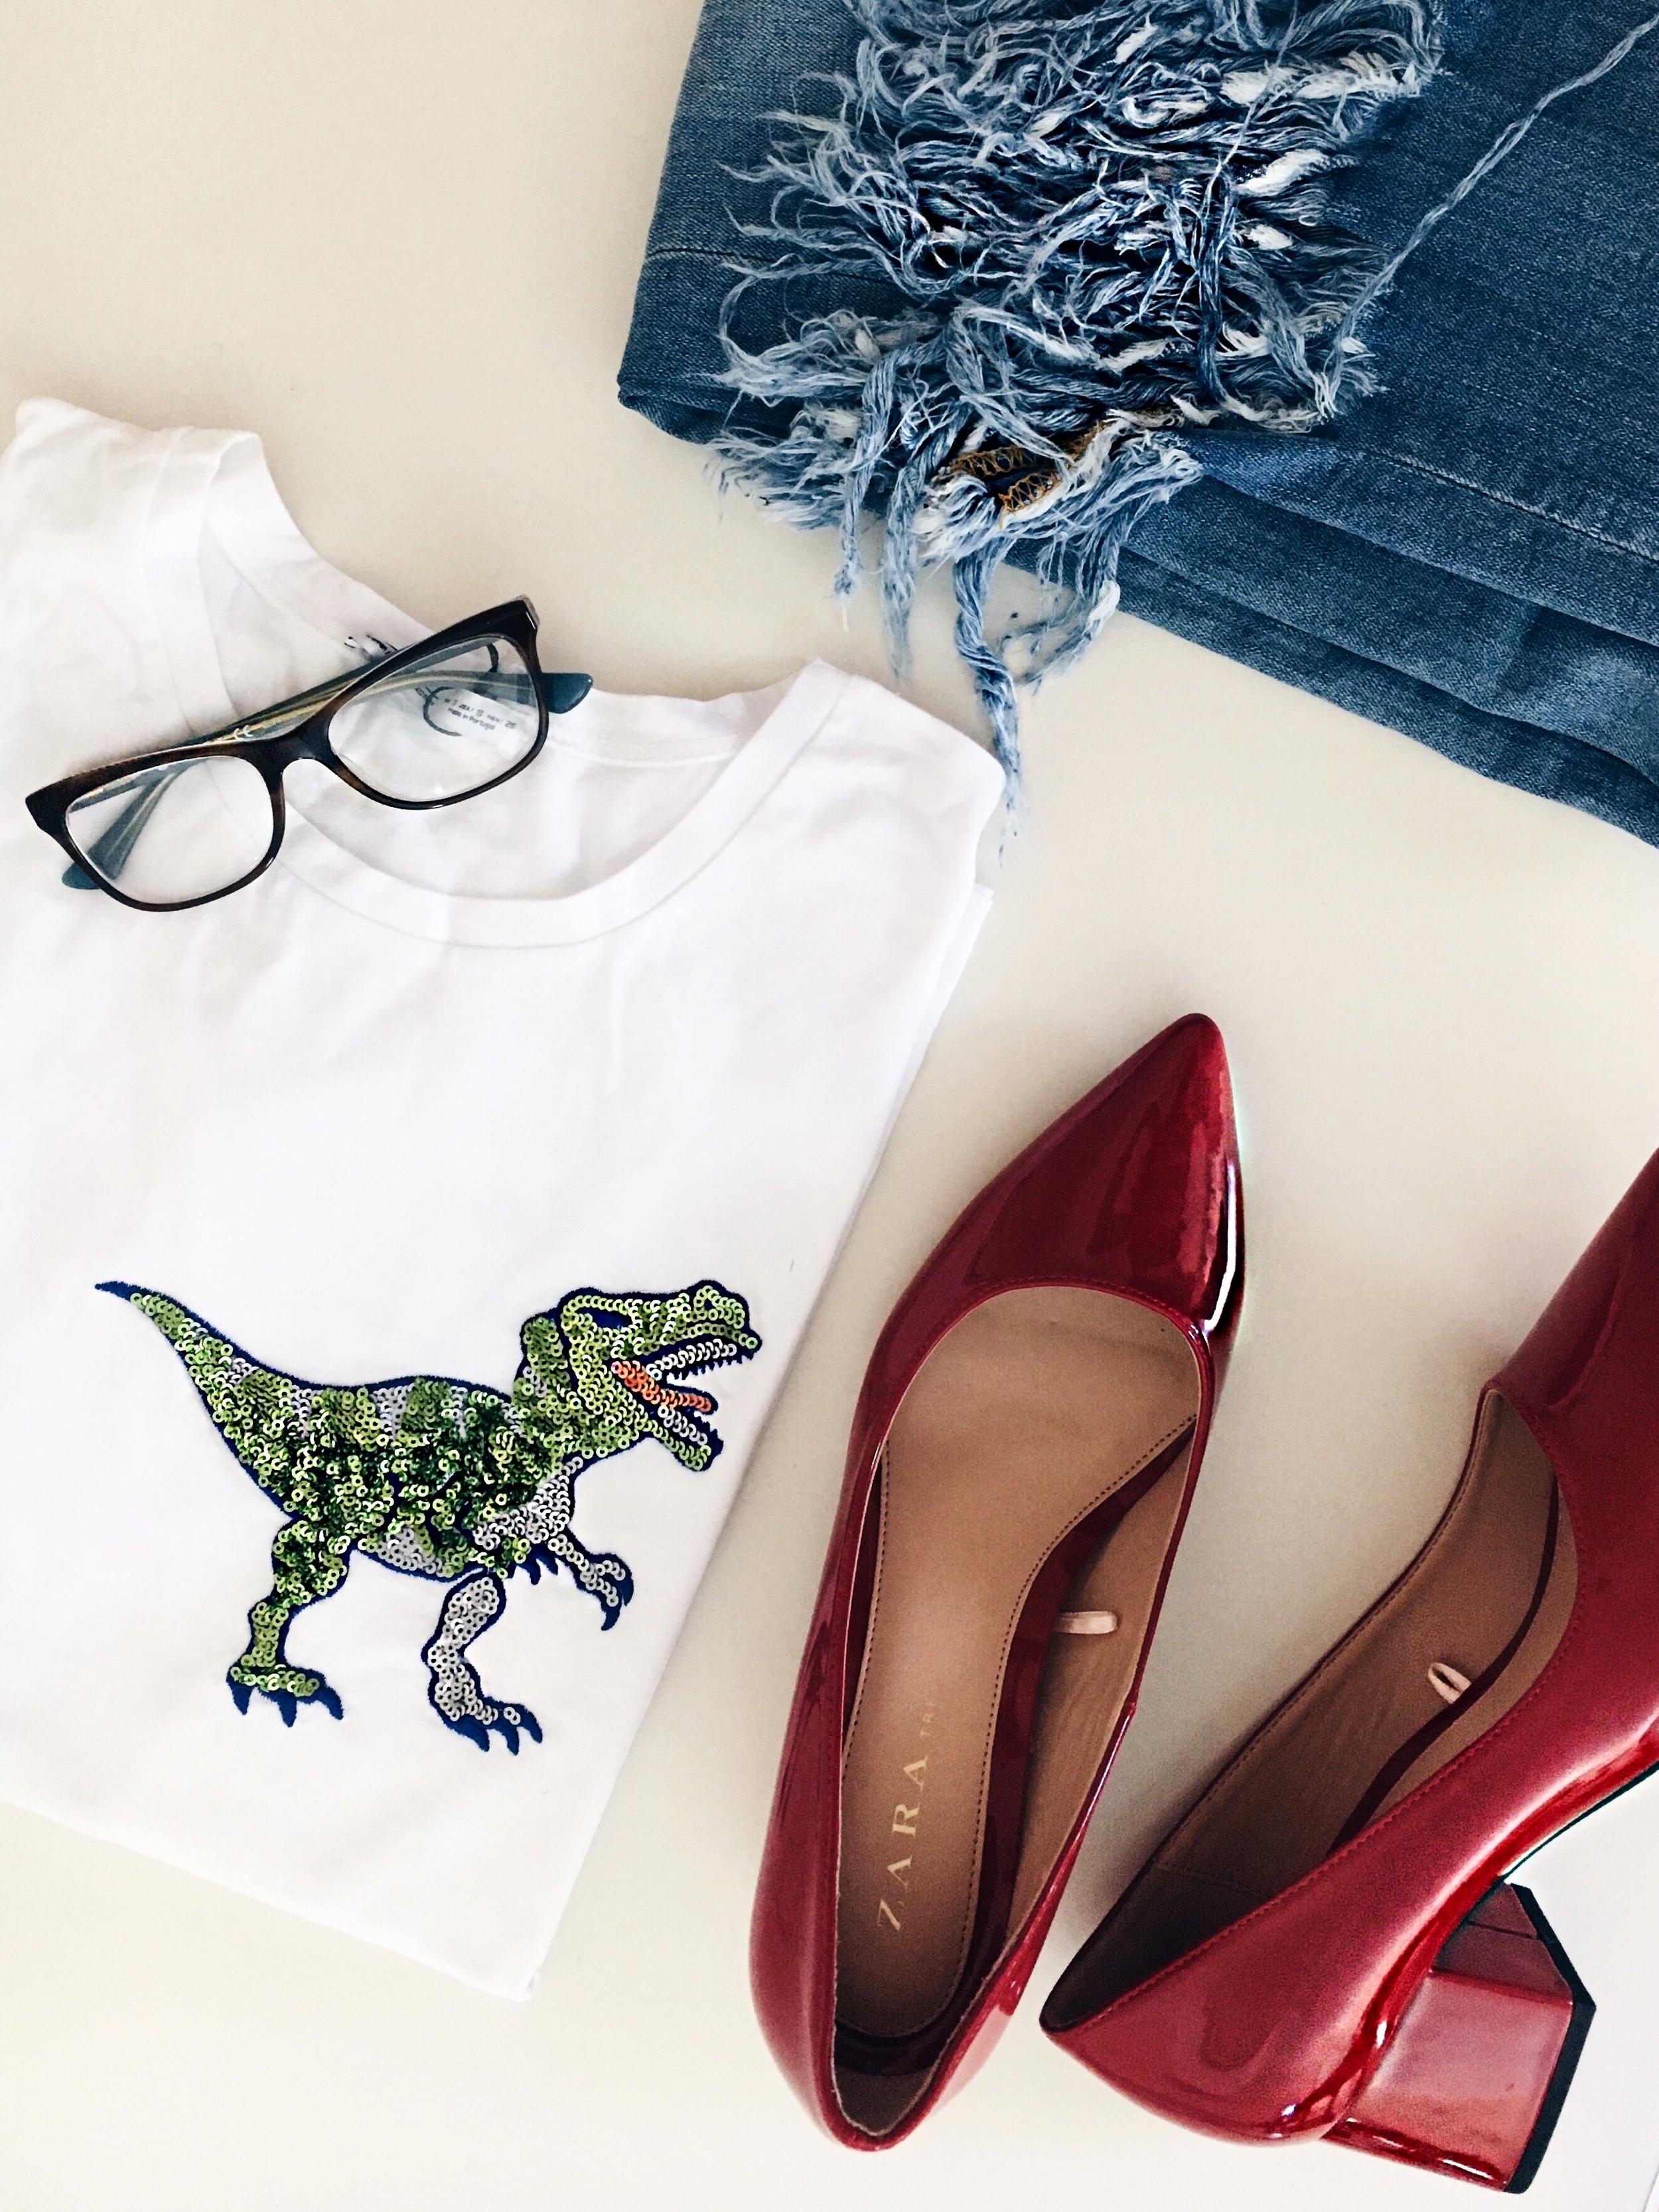 Top: Zara, Jeans: Zara, Shoes: Zara, Glasses: Vogue Eyewear